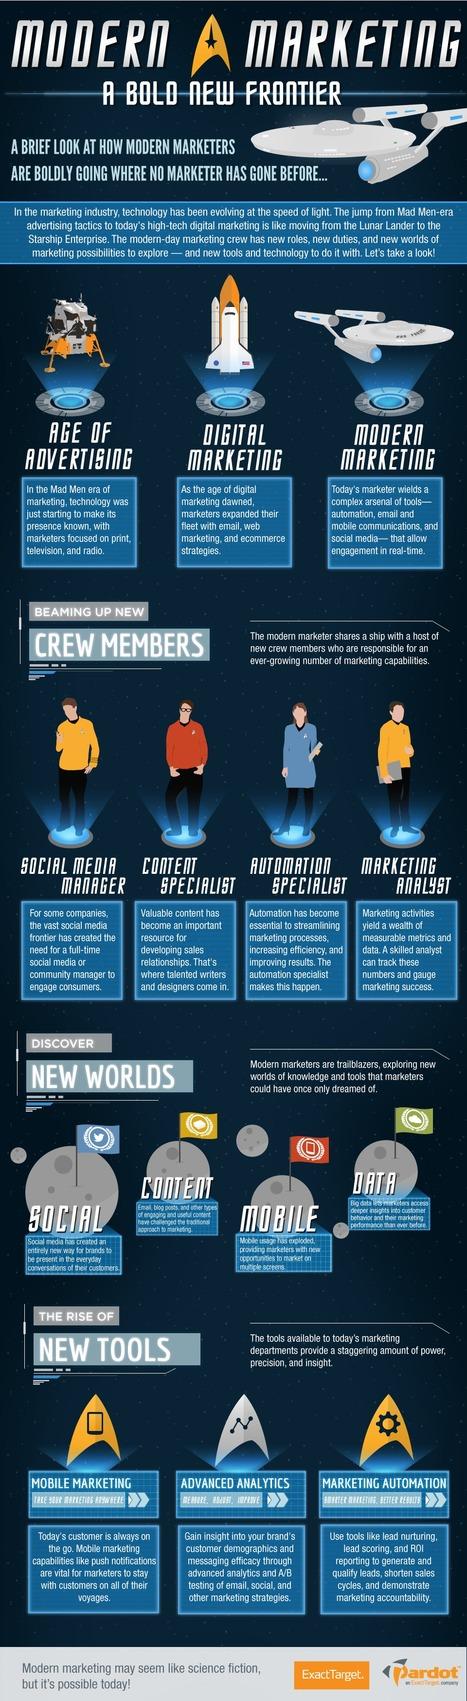 Modern Marketing: A Bold New Frontier [INFOGRAPHIC] - Pardot | Social Media & Internet Marketing Infographics | Scoop.it